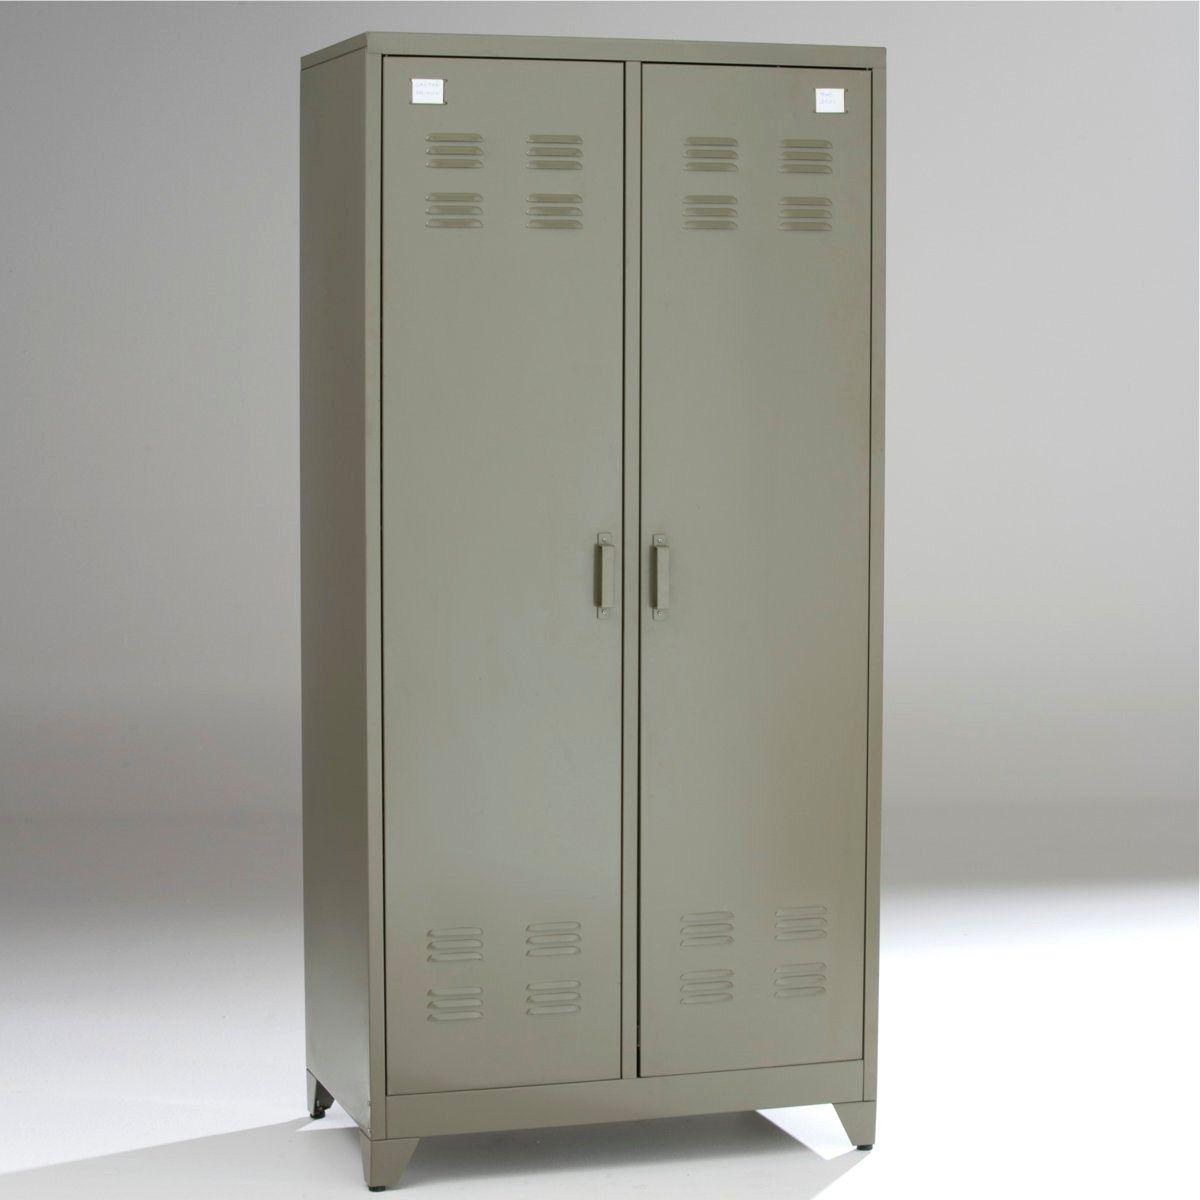 99 Vestiaire Metallique Ikea With Images Armoire Locker